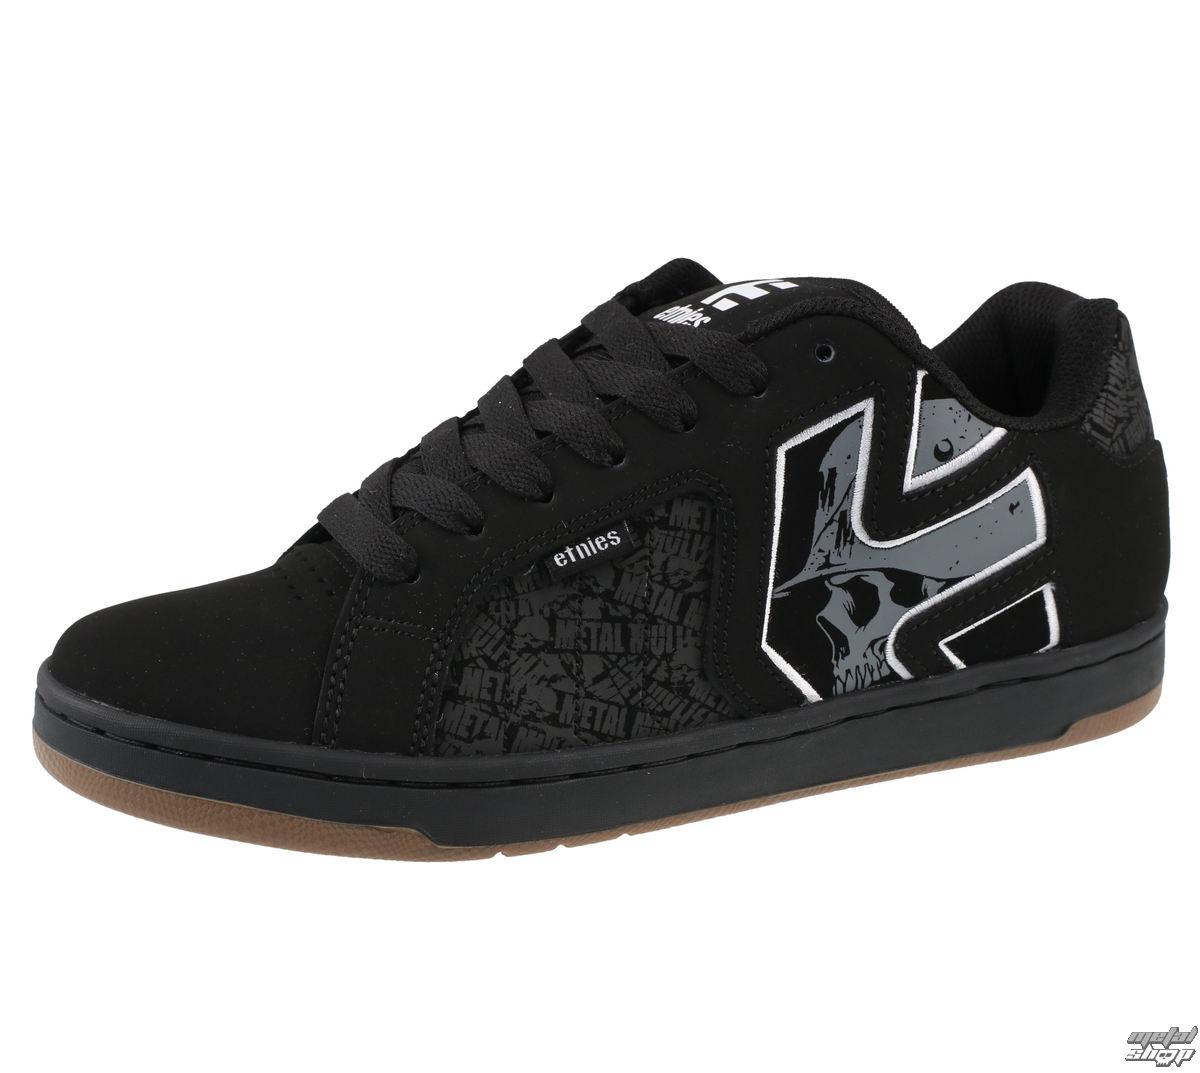 73dfb468de topánky pánske ETNIES - Metal Mulisha - Fader 2 - BLACK   GREY   WHITE